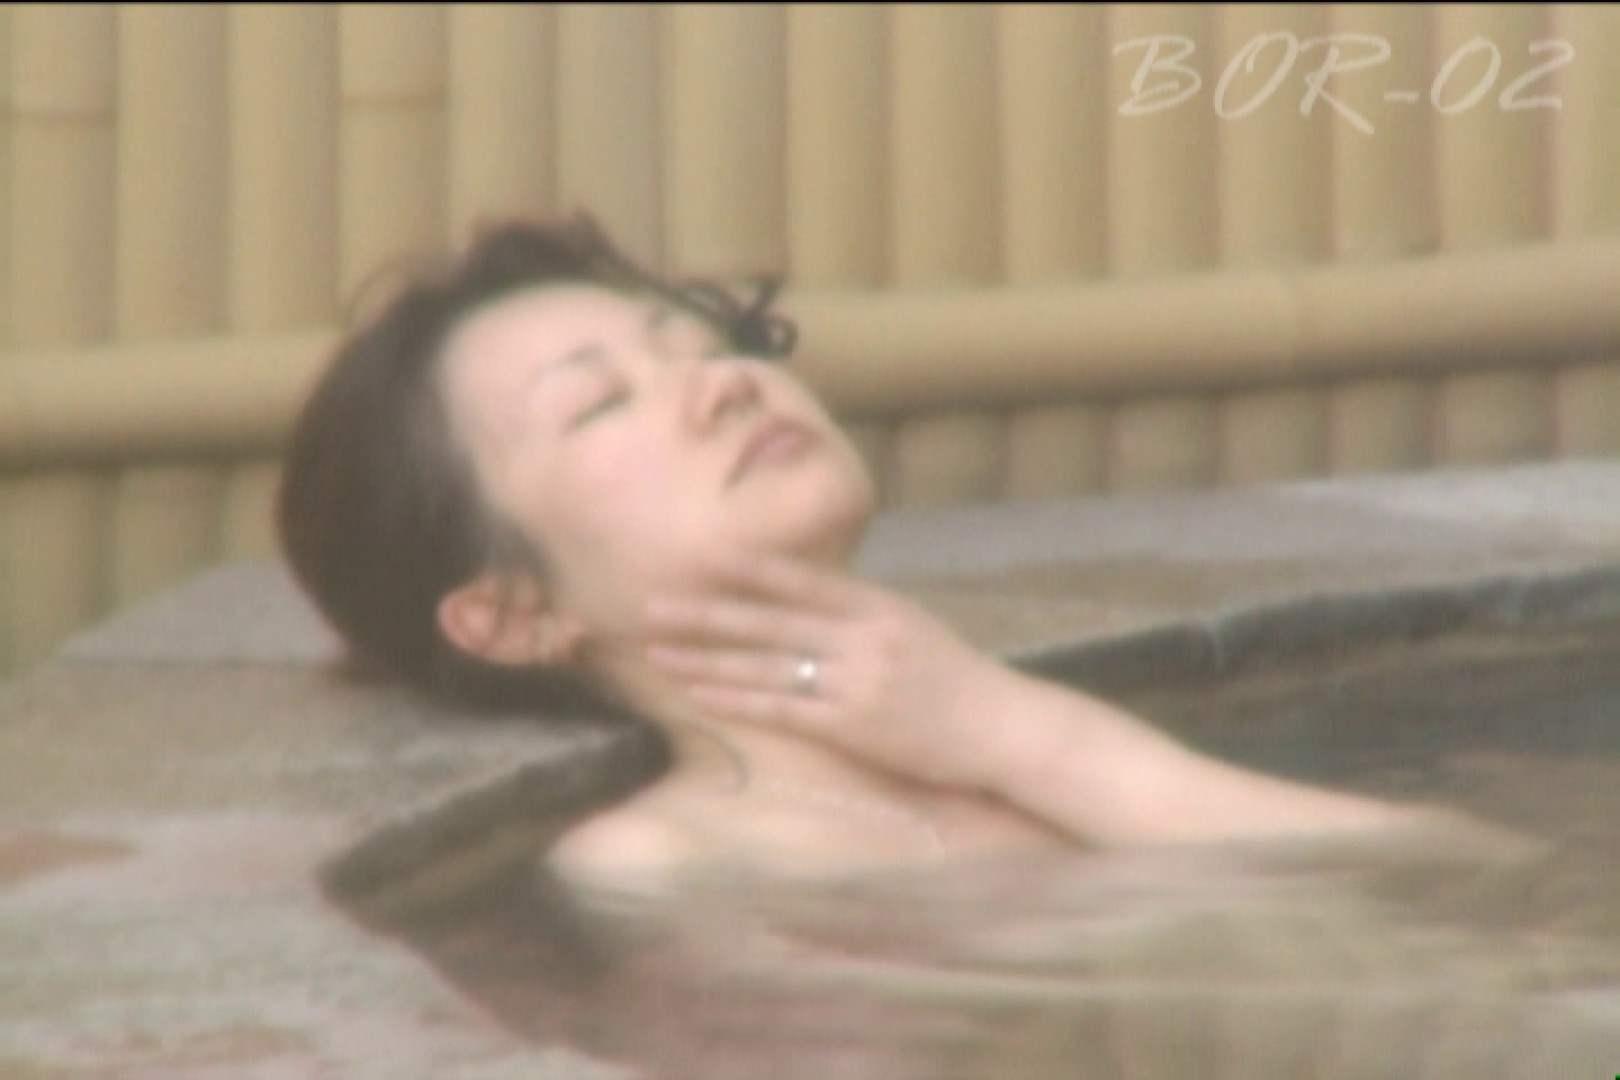 Aquaな露天風呂Vol.477 露天 アダルト動画キャプチャ 99PICs 56